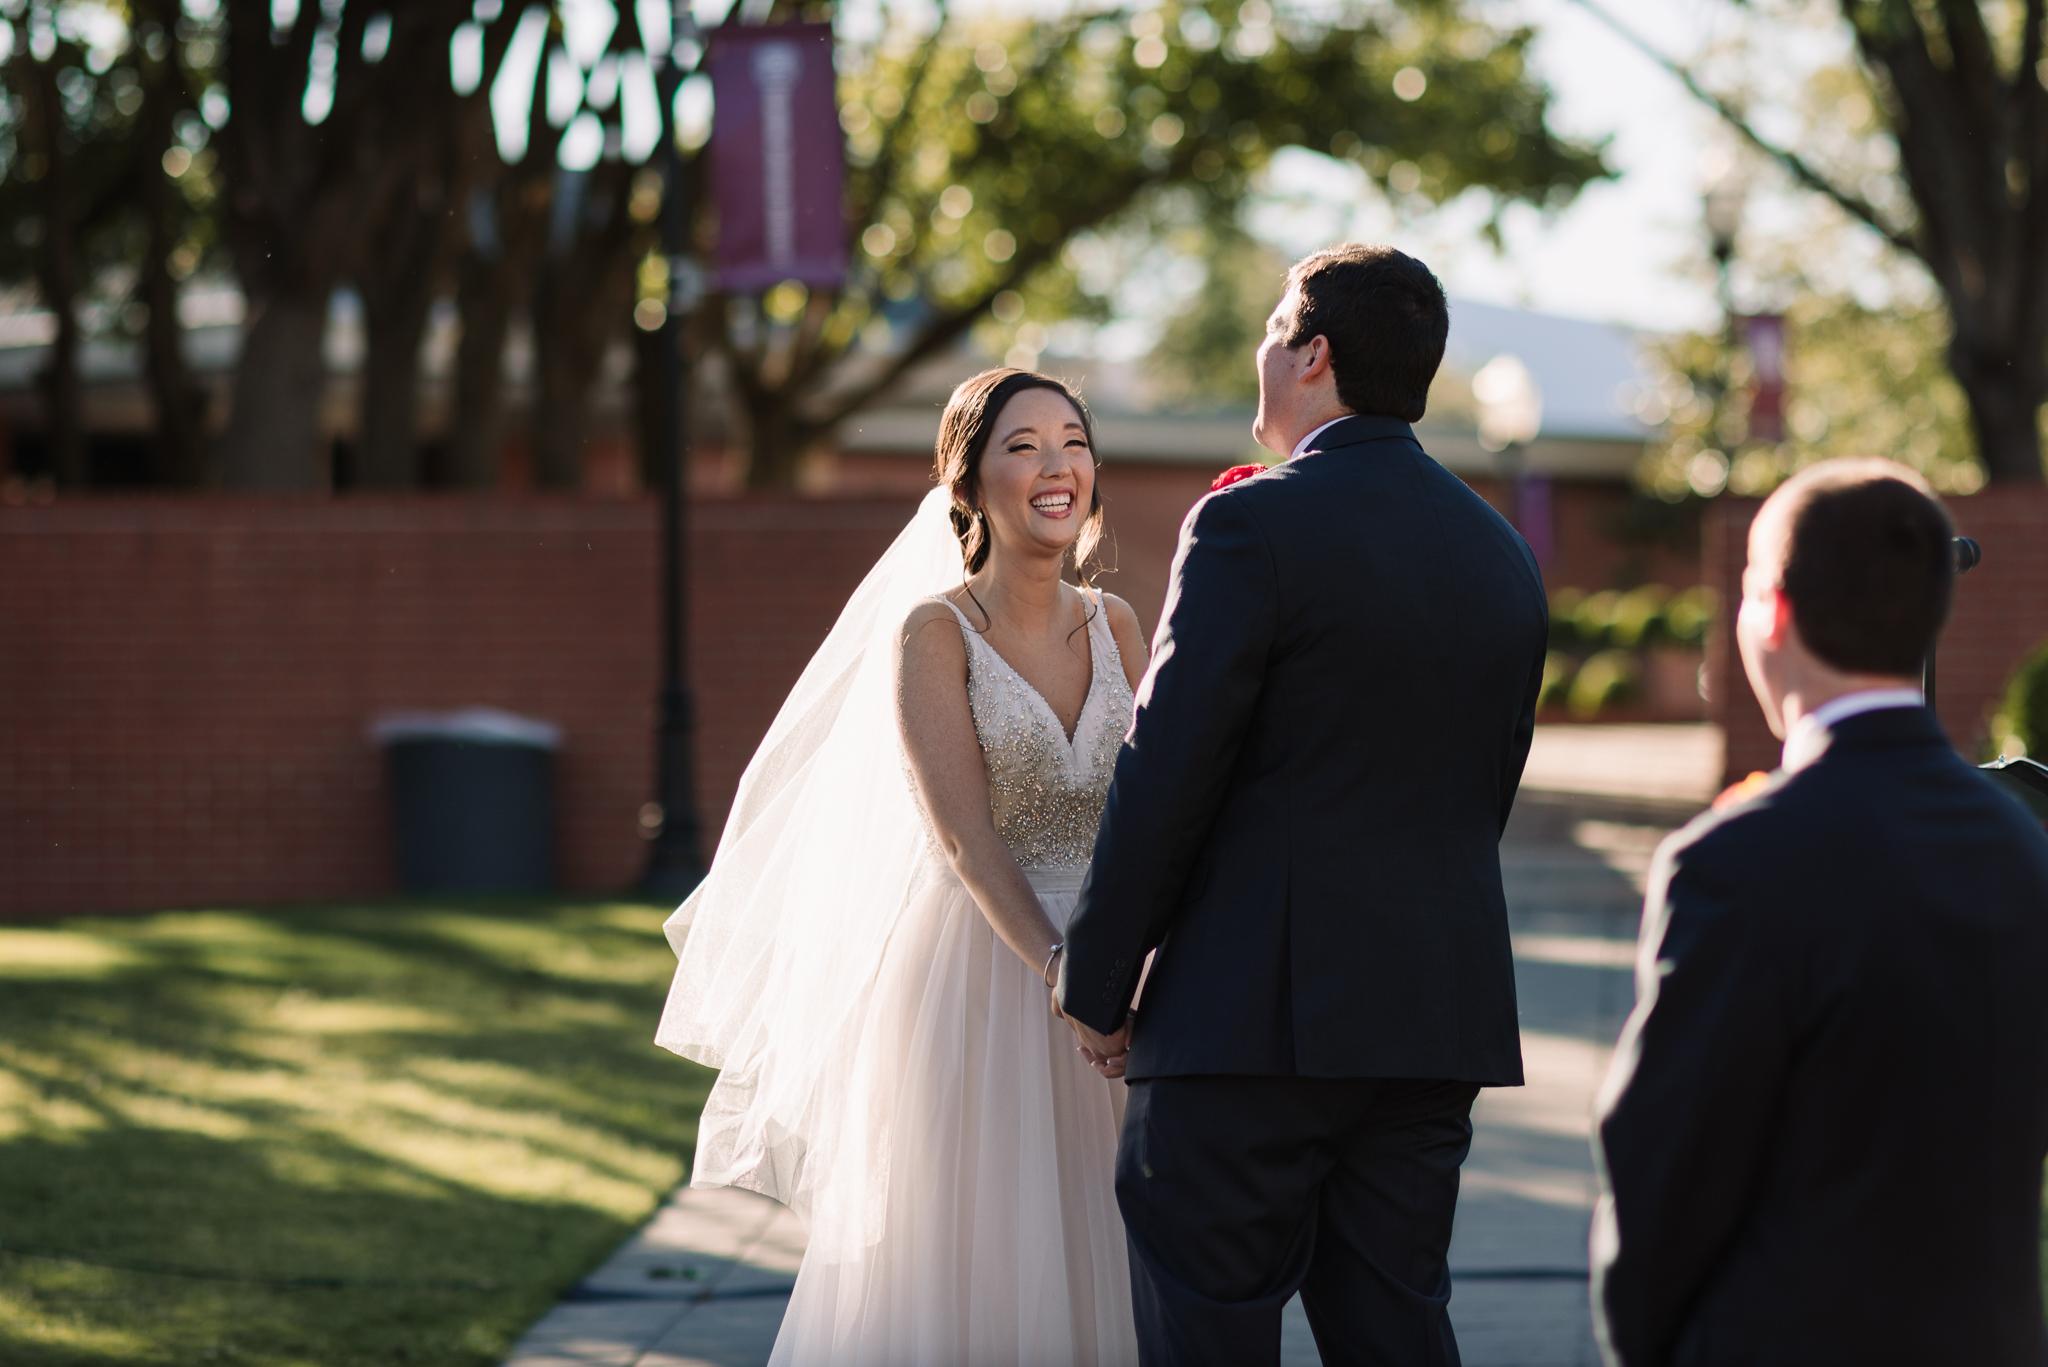 Oklahoma-Christian-University-Wedding-0312.jpg